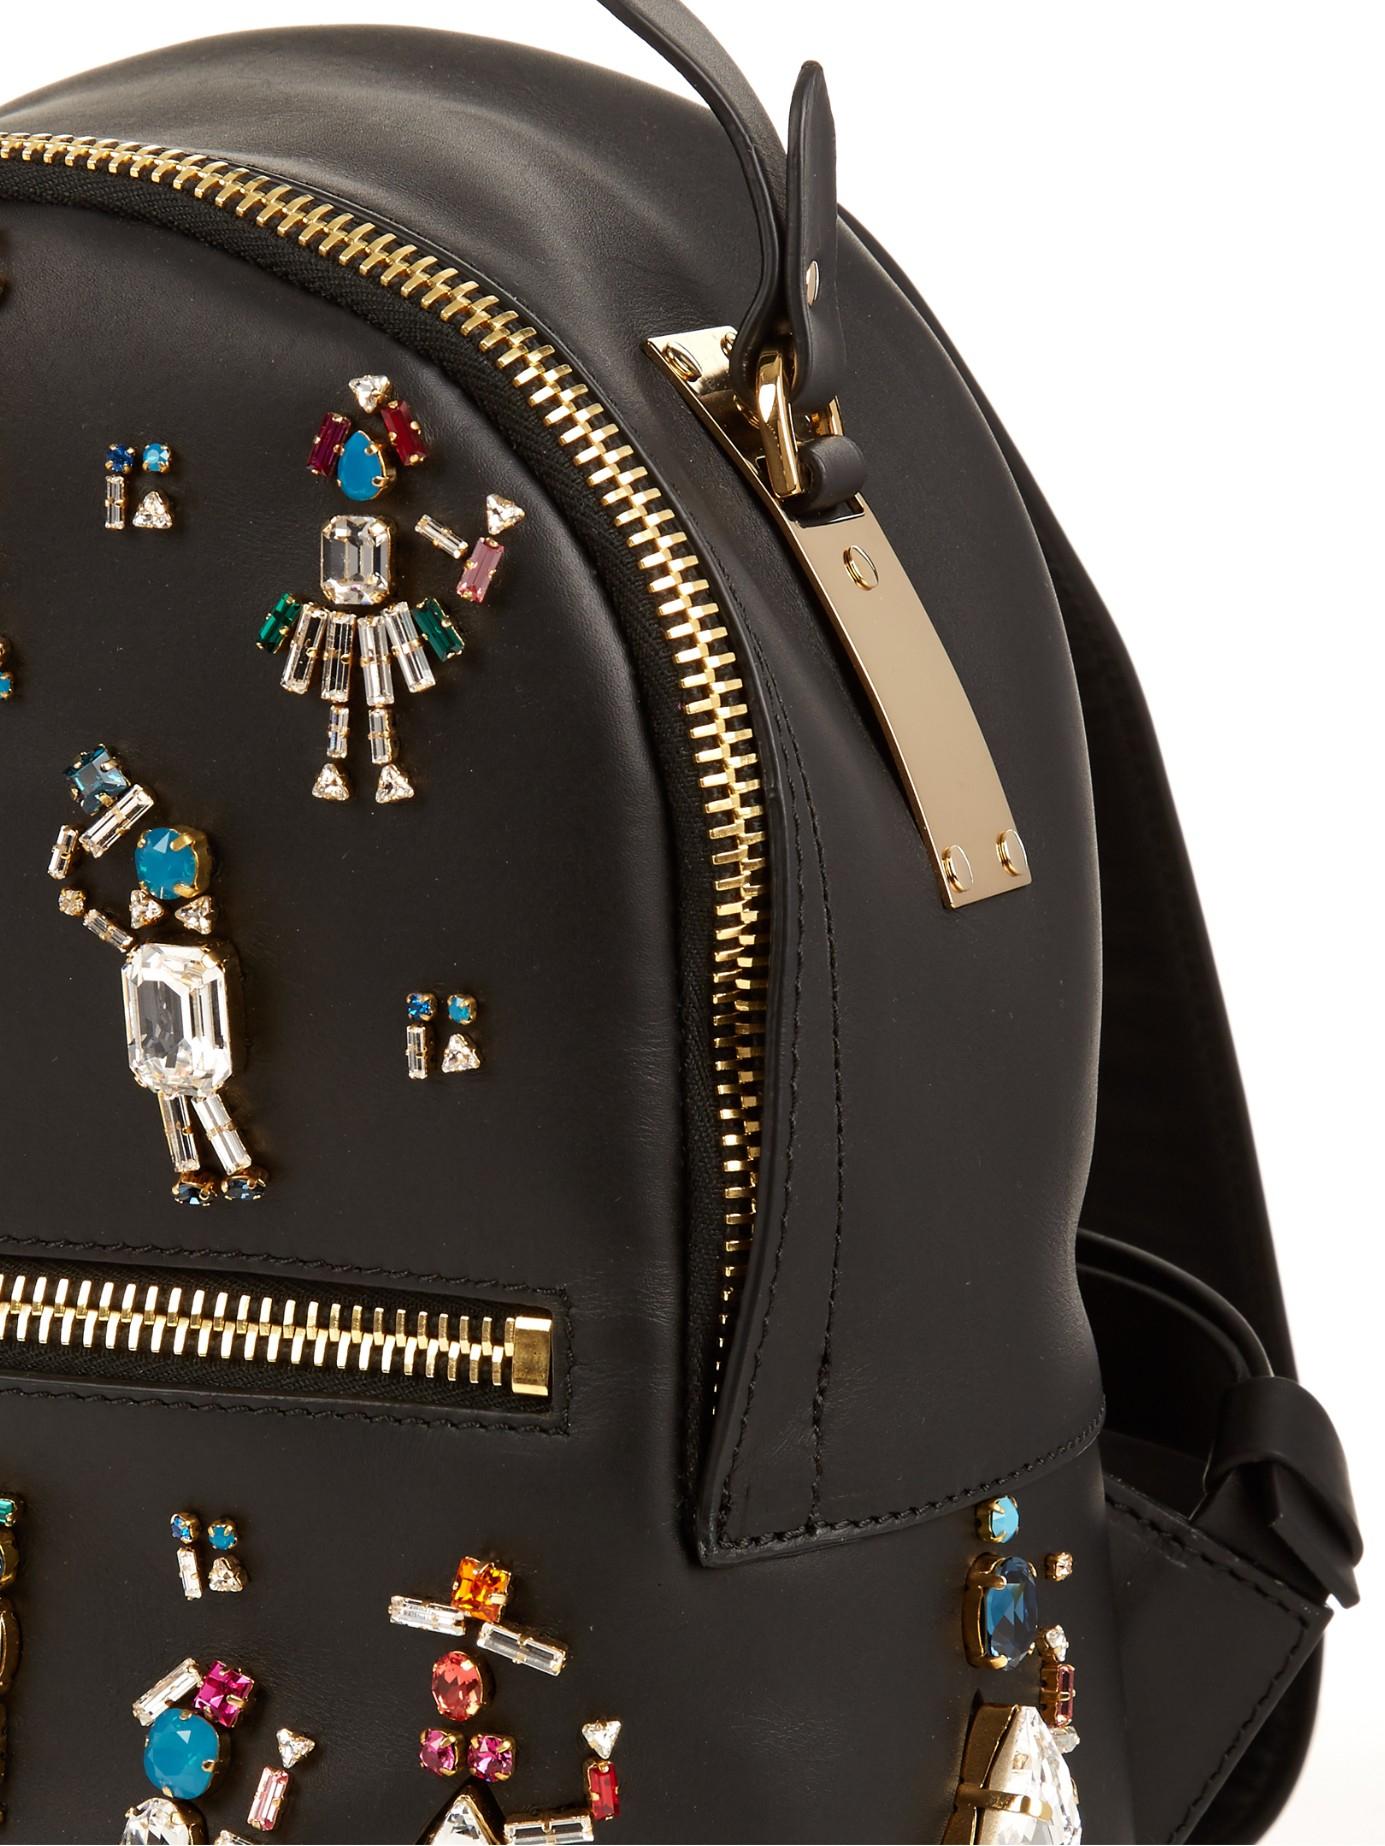 Sophie Hulme Wilson Embellished Mini Leather Backpack in Black (Natural)